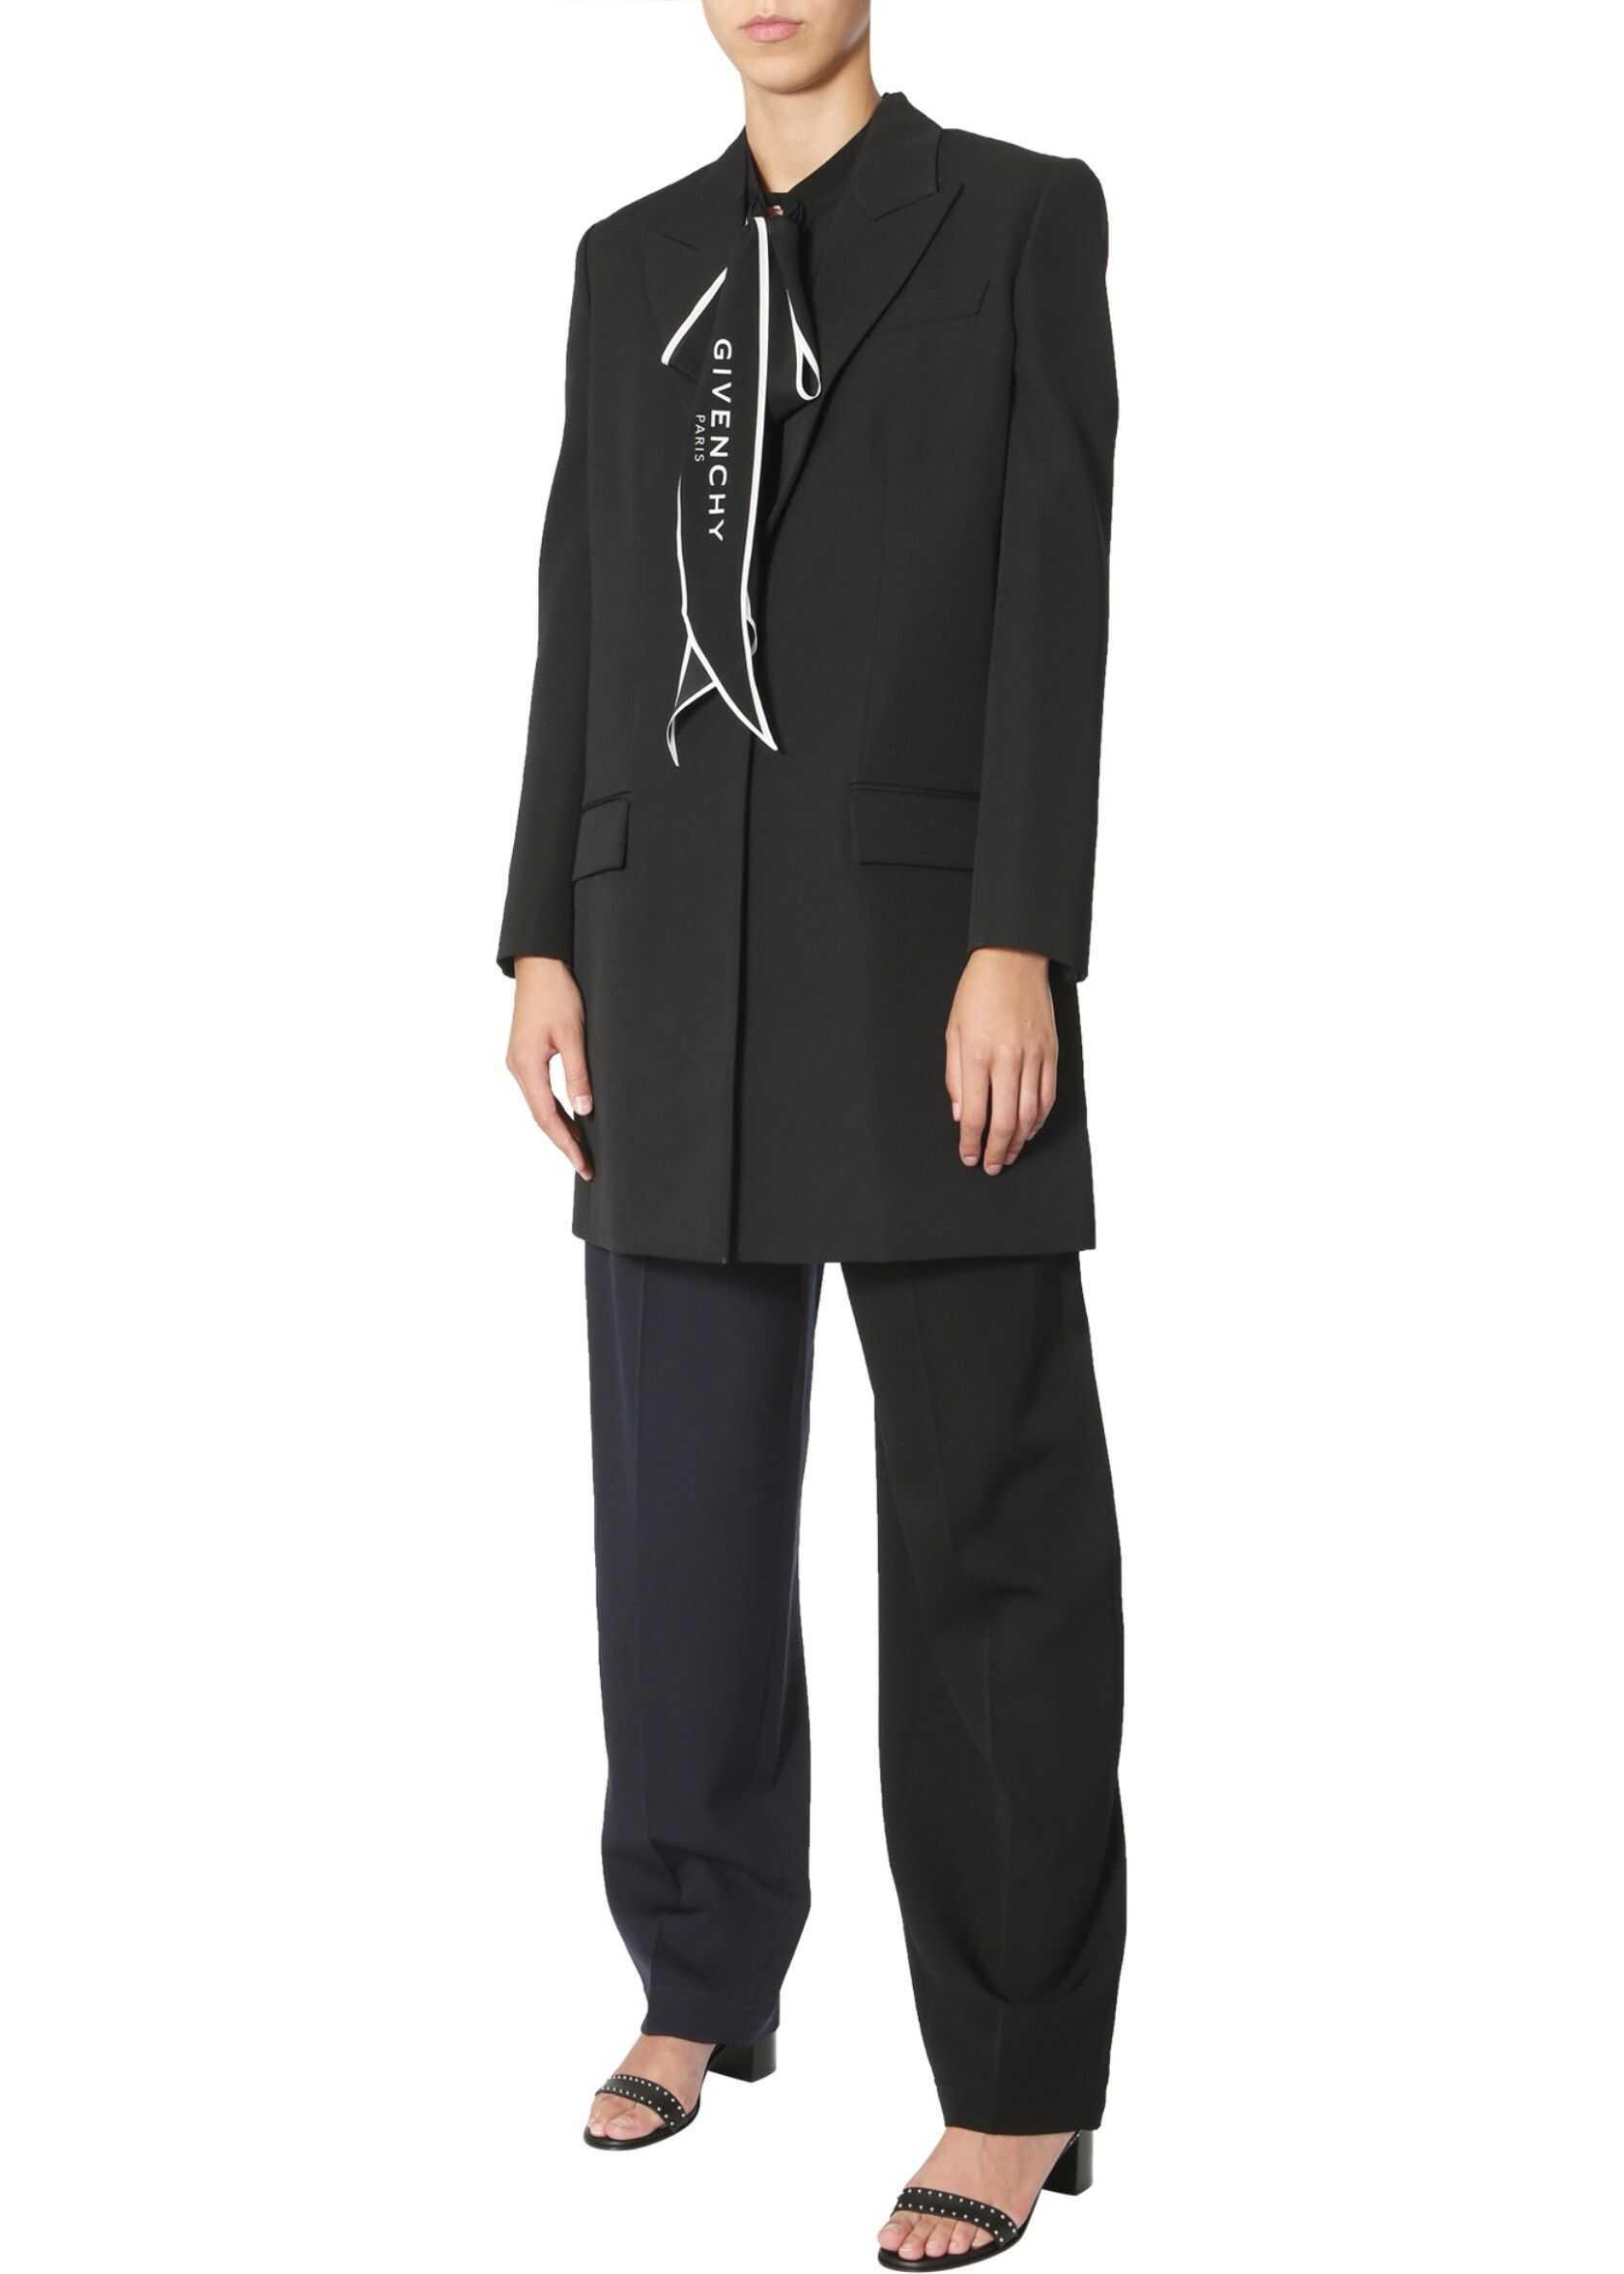 Givenchy Long Blazer BWC04G11BN_001 BLACK image0